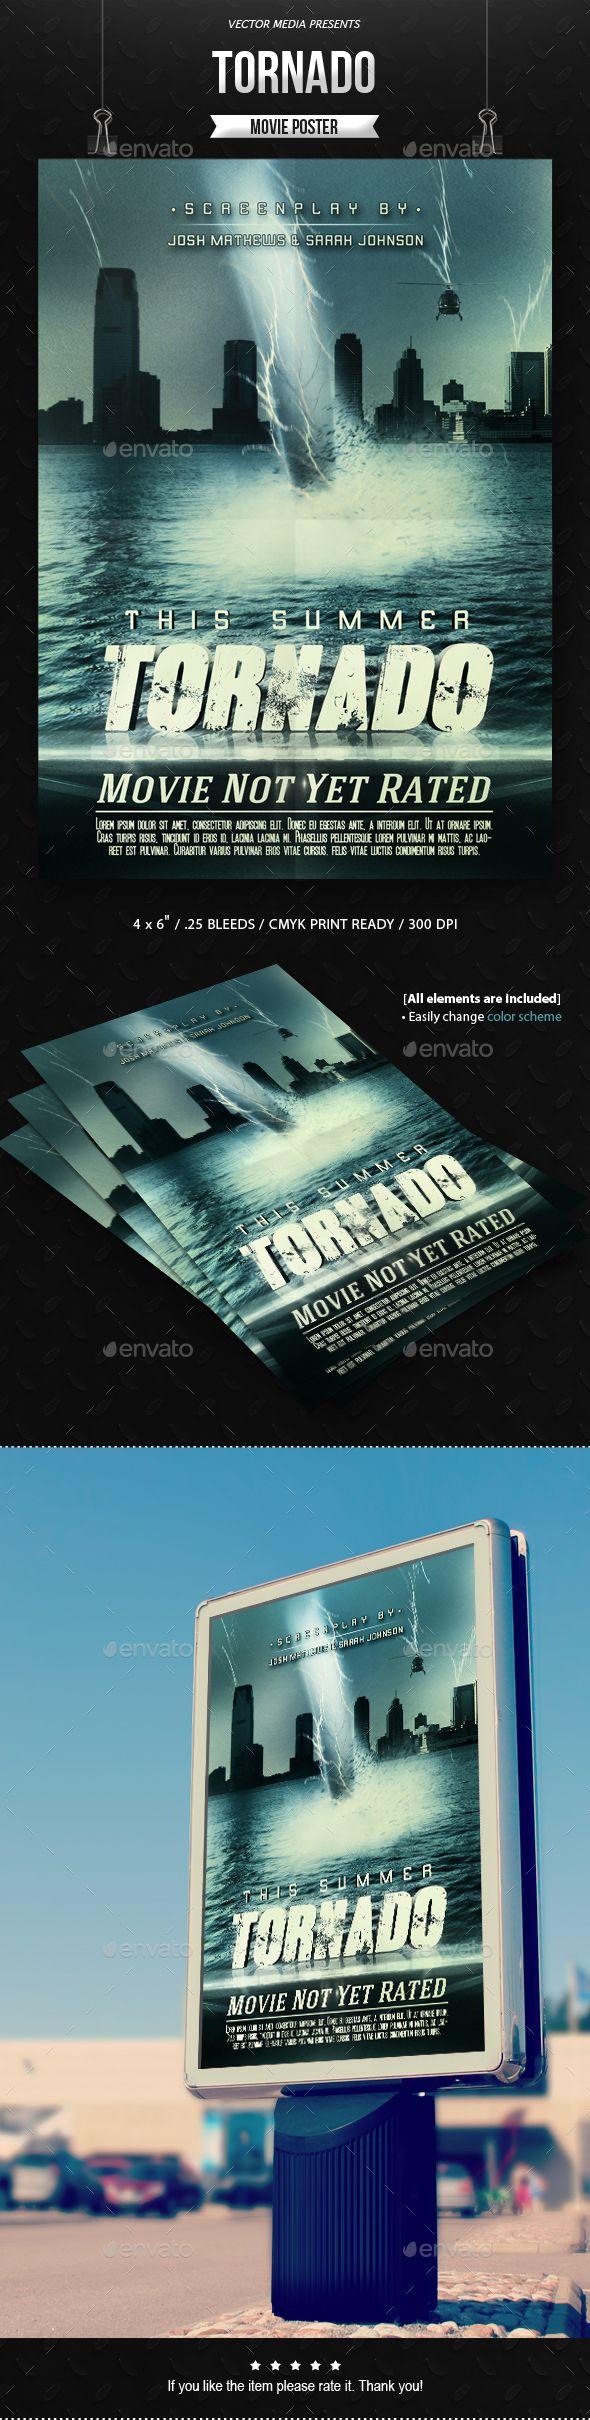 Tornado  Movie Poster — Photoshop PSD #print templates #casting • Available here → https://graphicriver.net/item/tornado-movie-poster/8491098?ref=pxcr